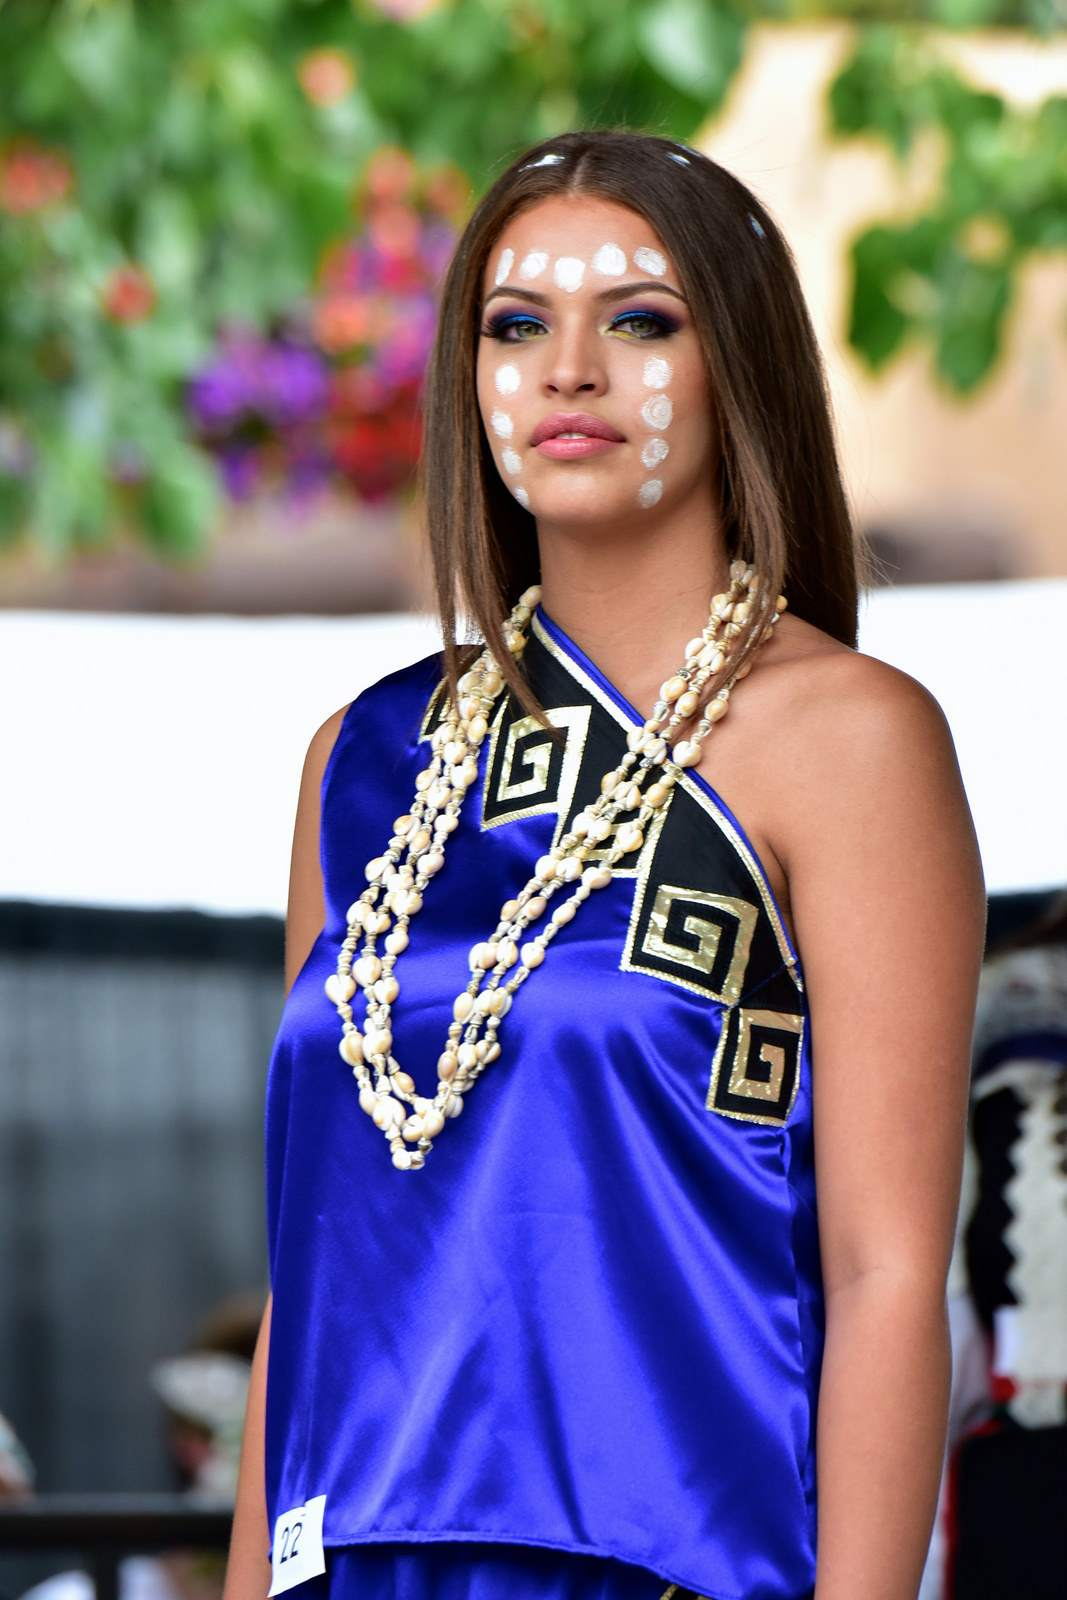 native american clothing Native American Clothing Contest at Santa Fe Indian Market